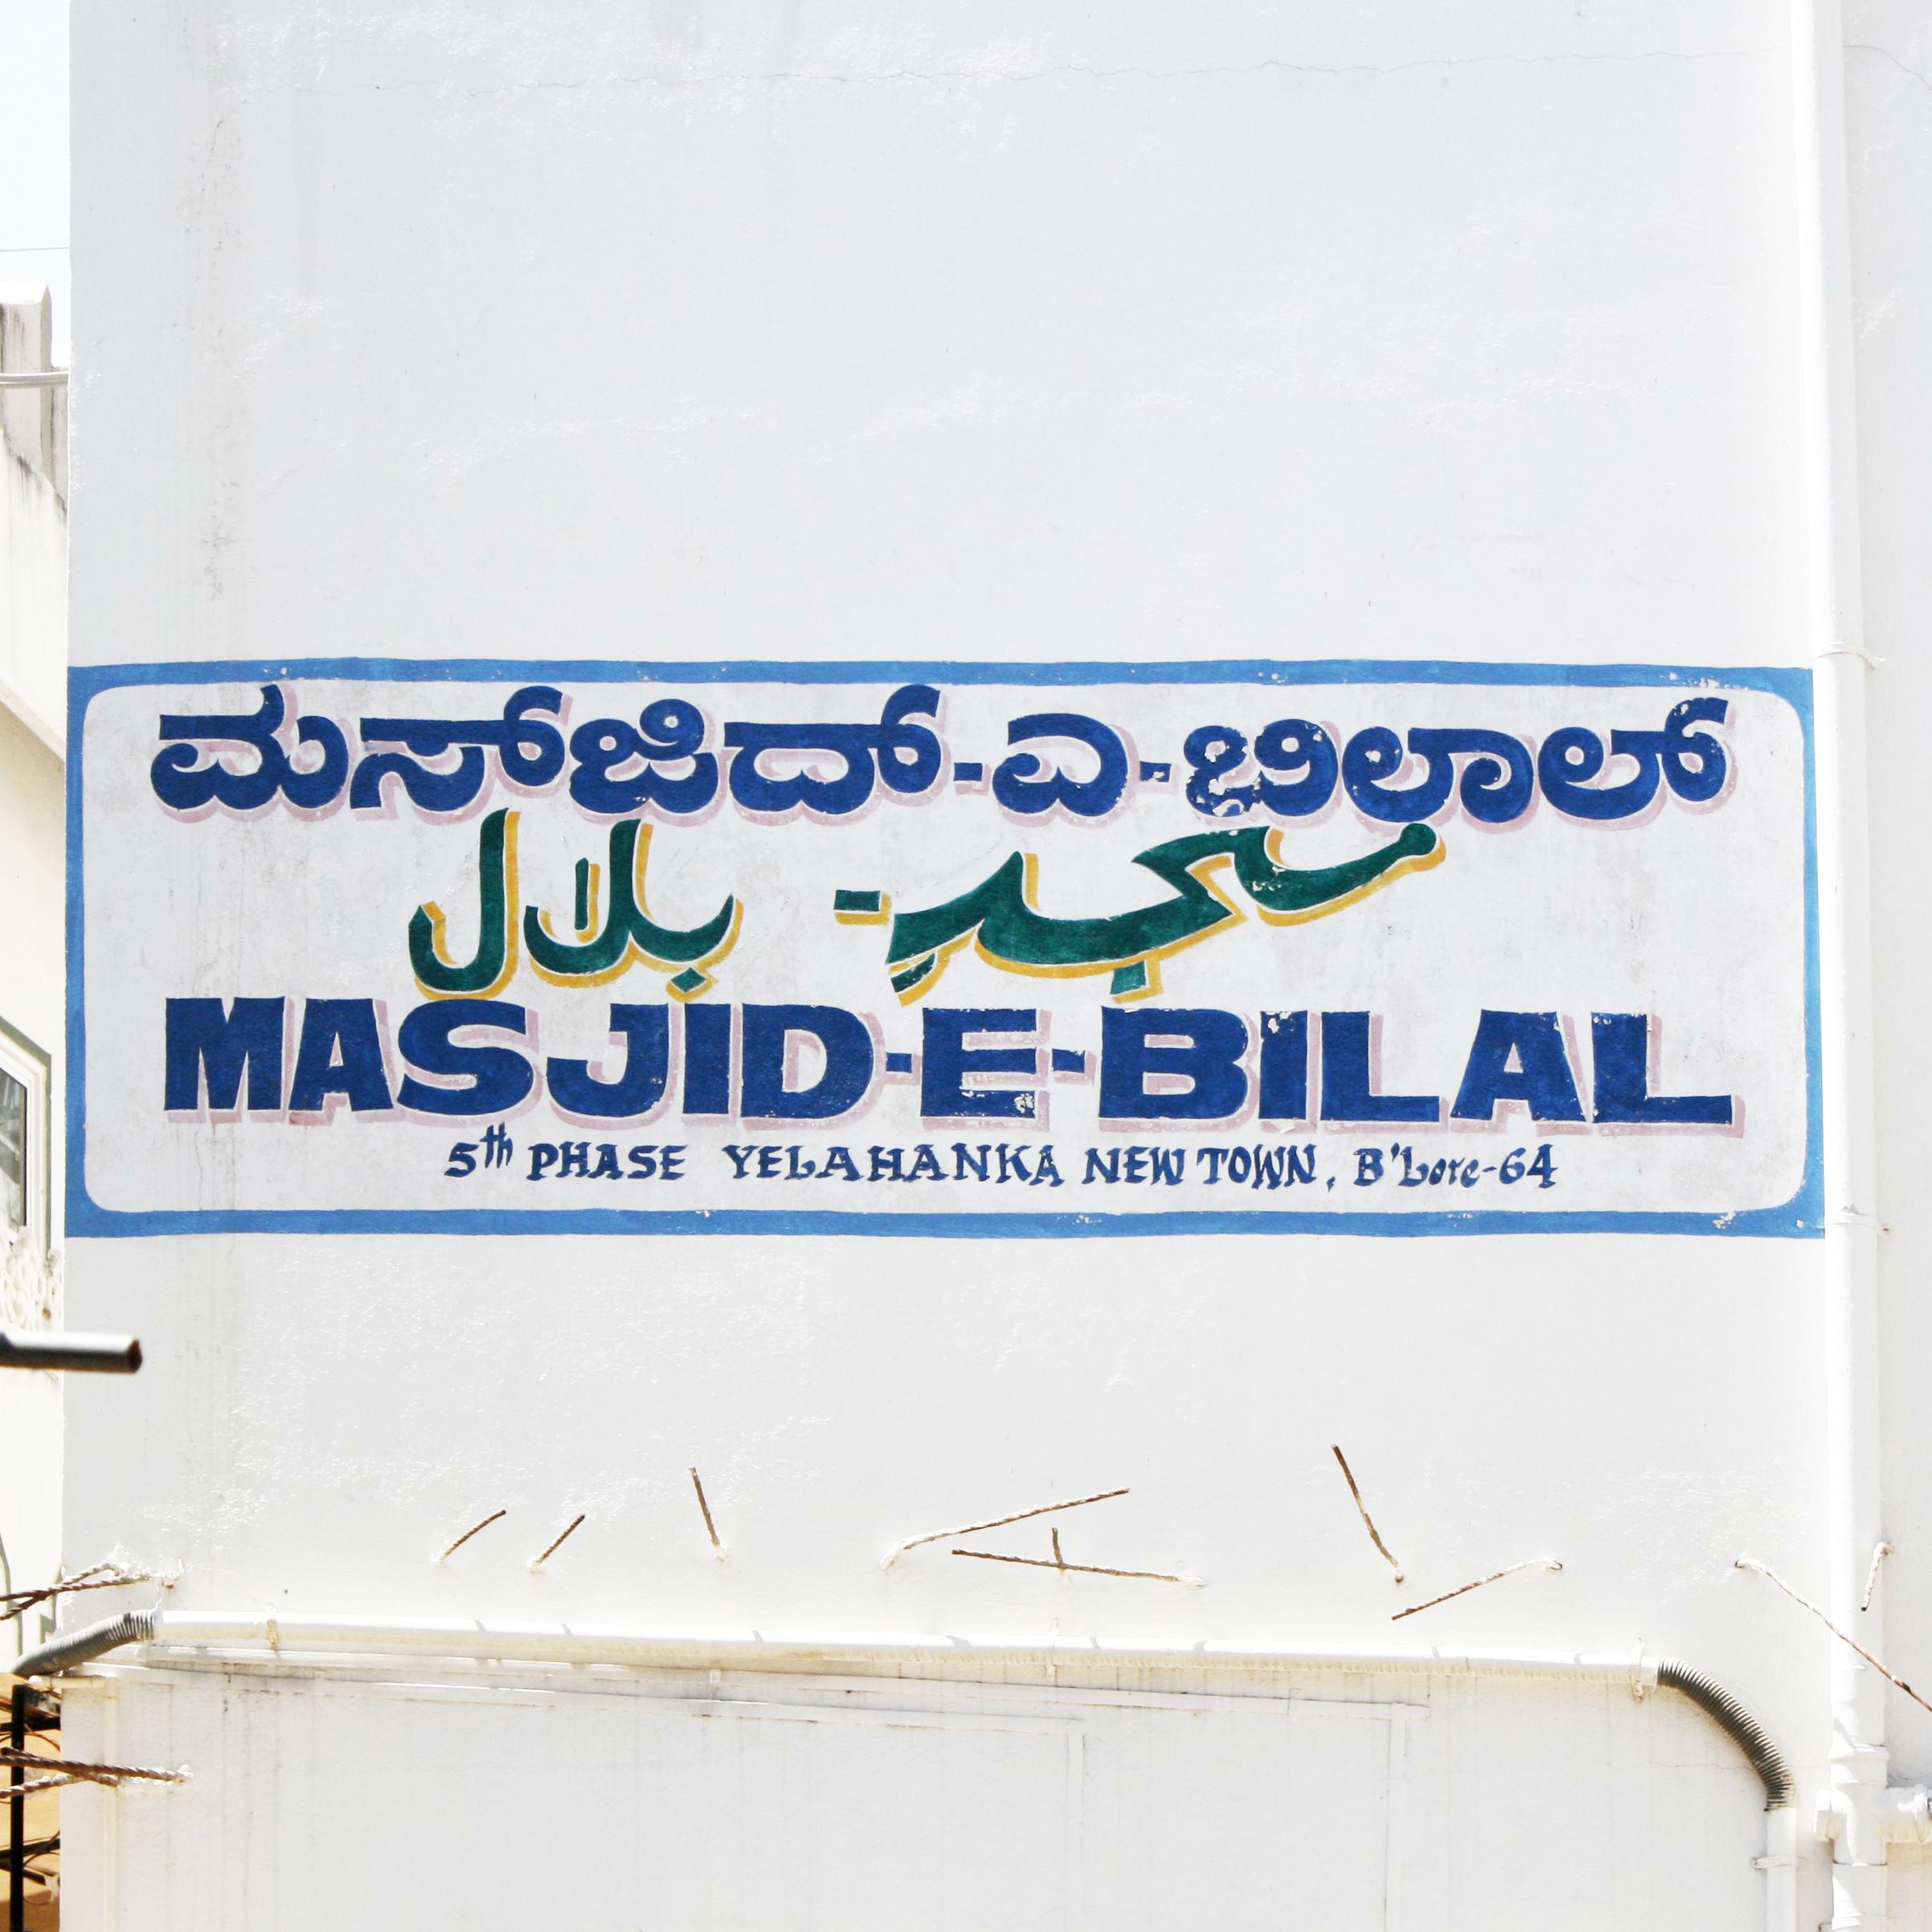 Masjid-e-Bilal